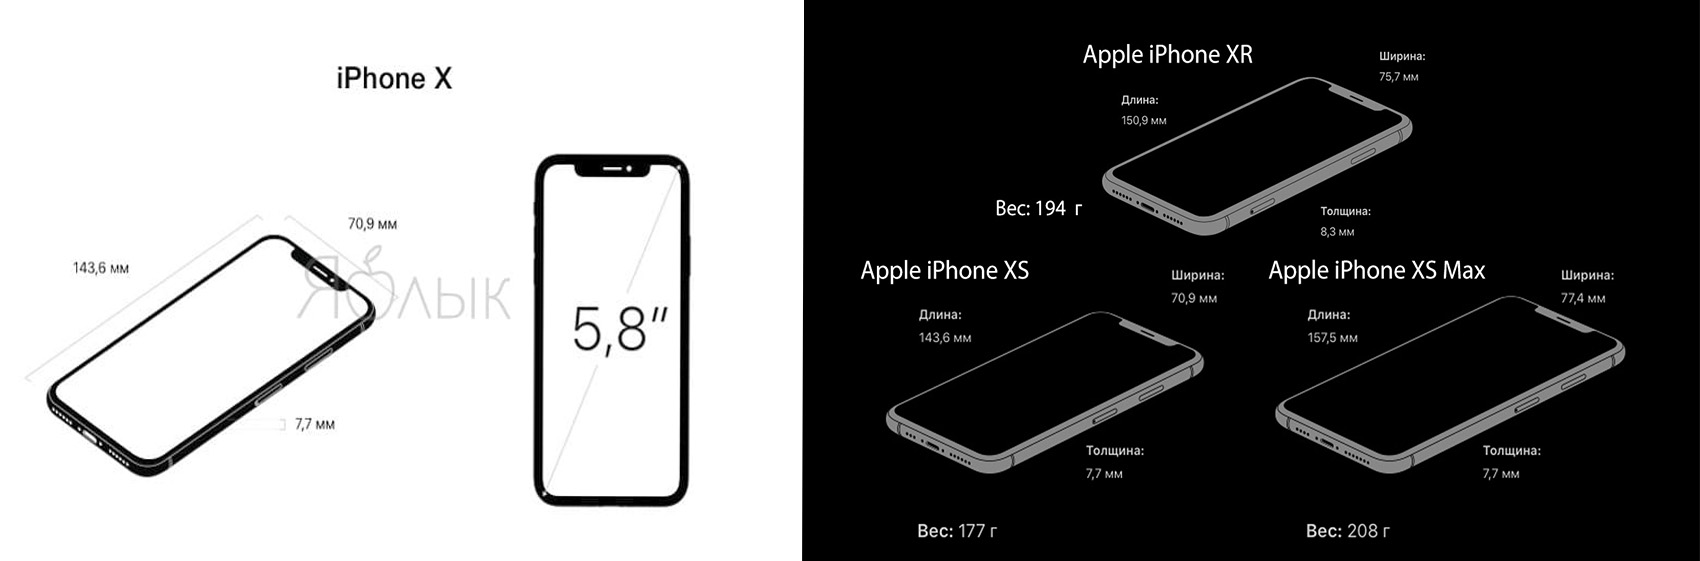 Подходят ли чехлы от iPhone X к iPhone XR